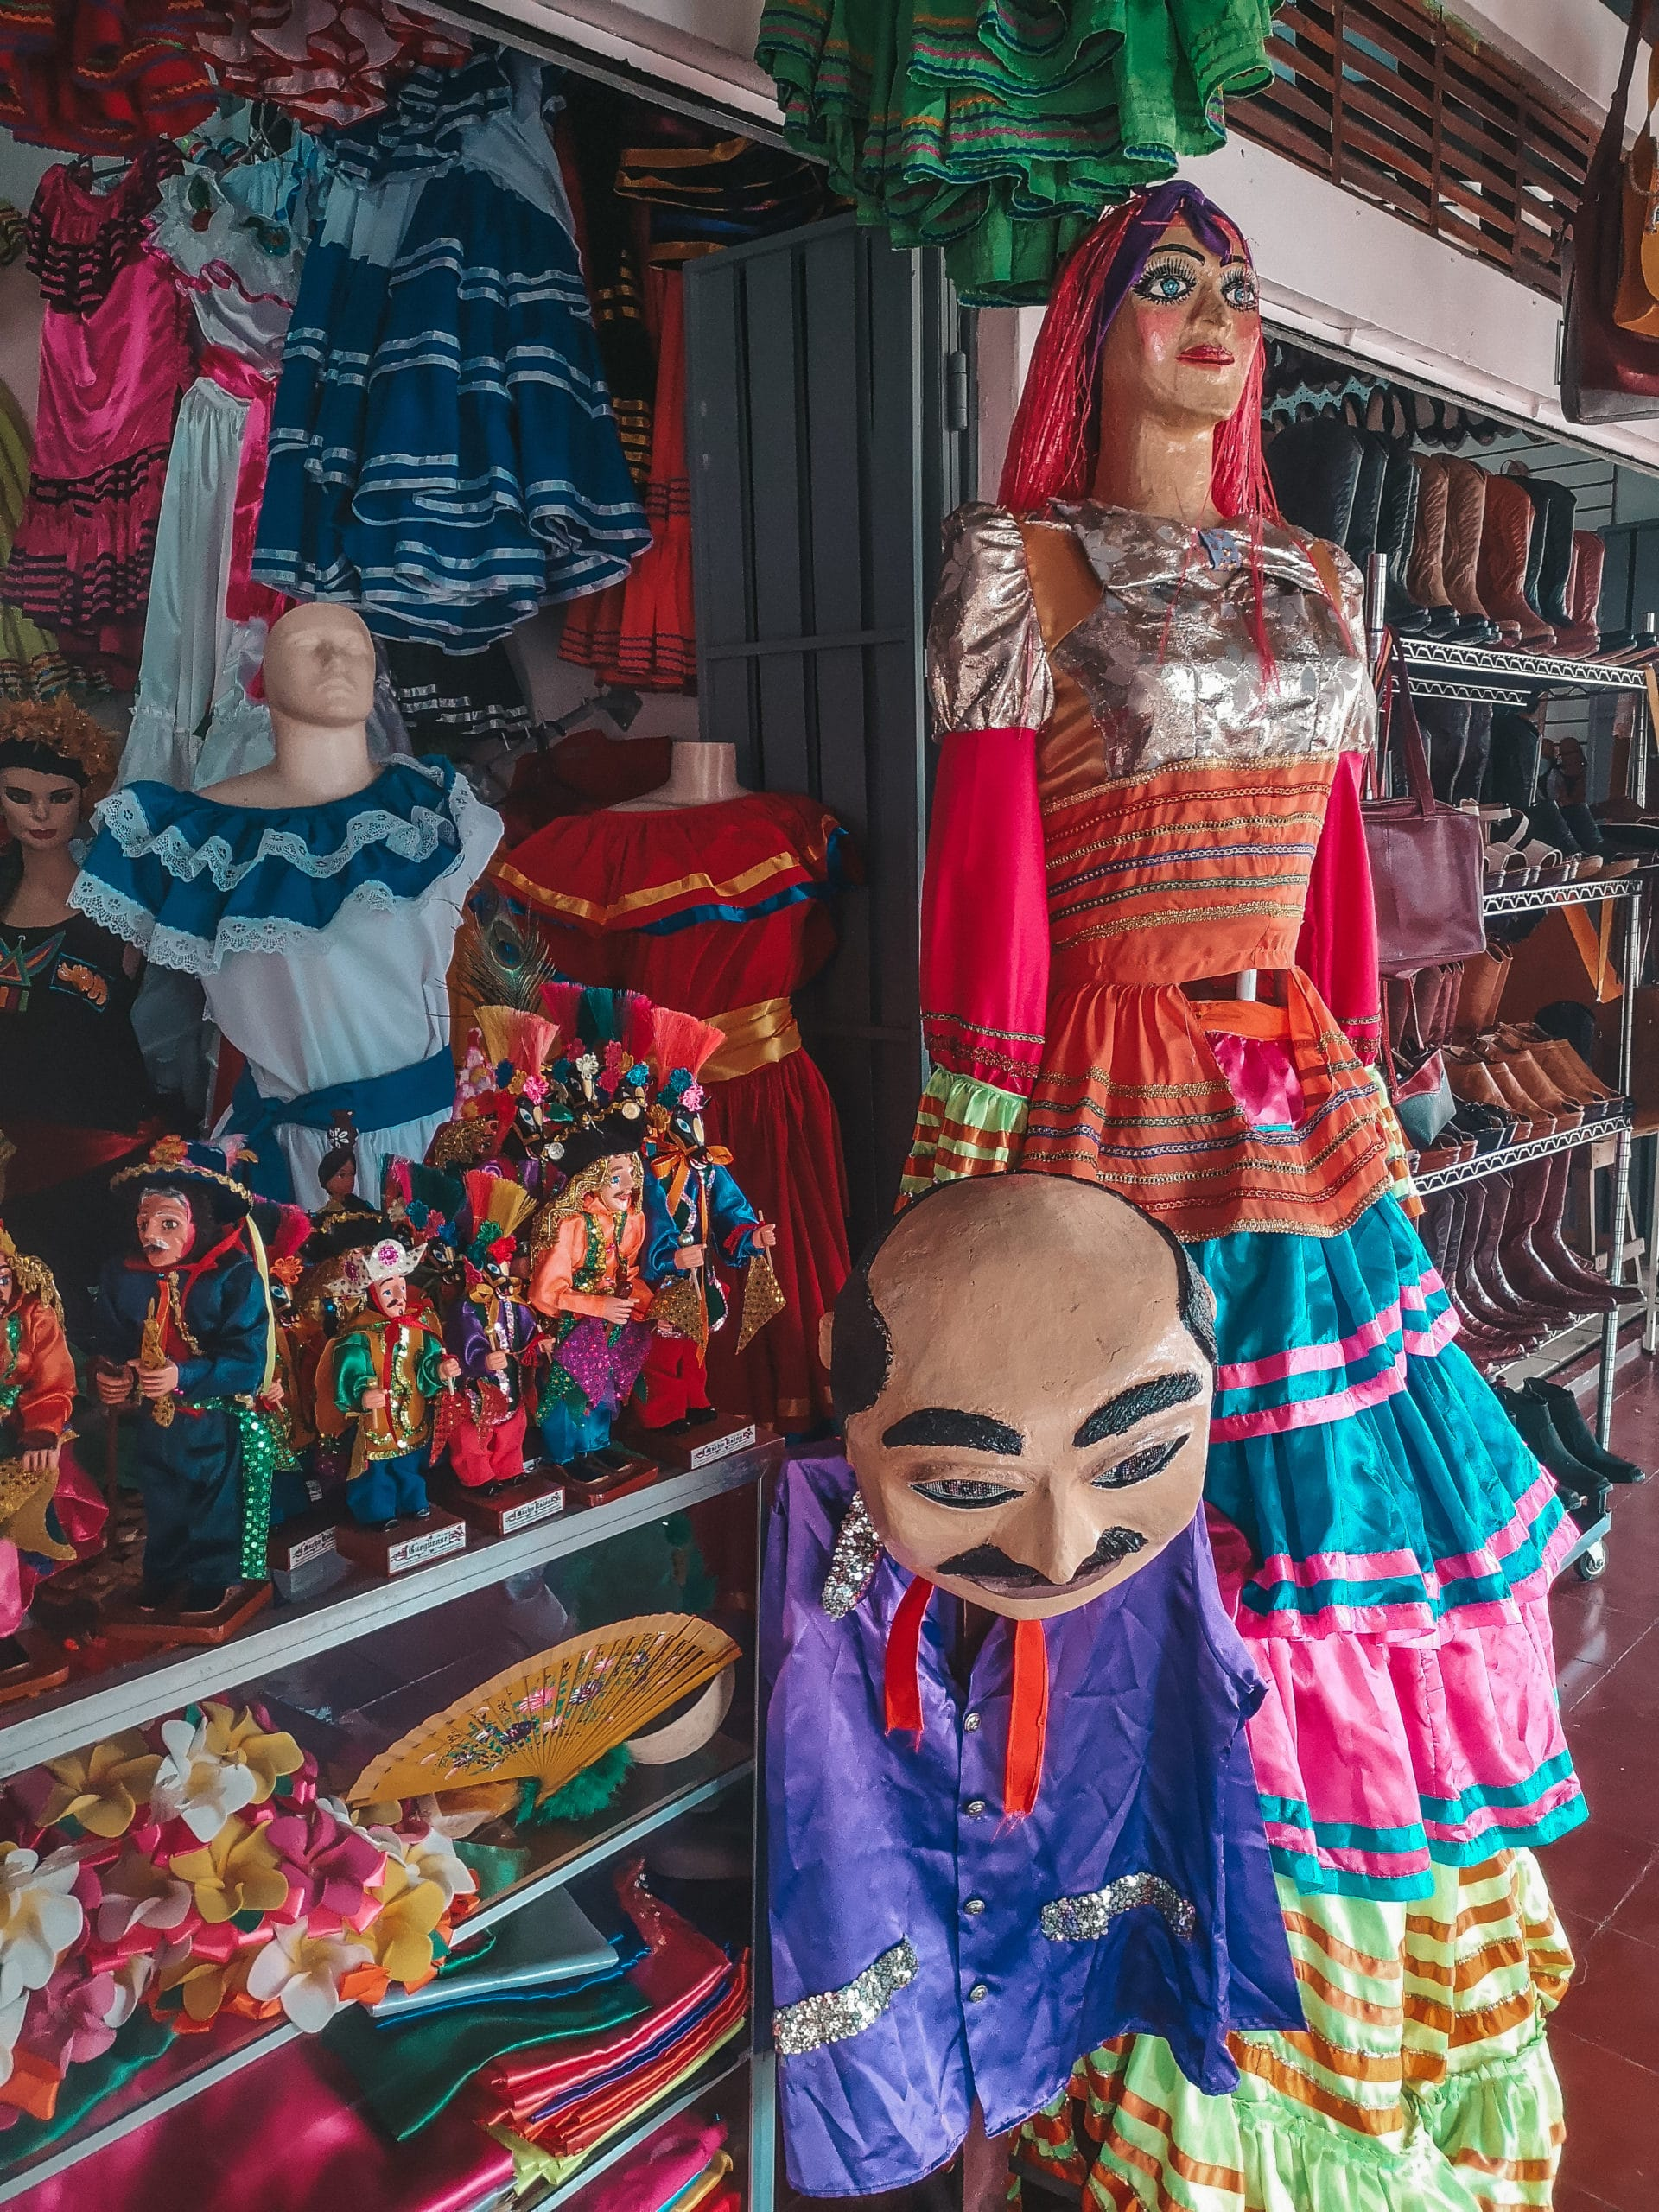 Marché d'artisanat de Masaya, Nicaragua